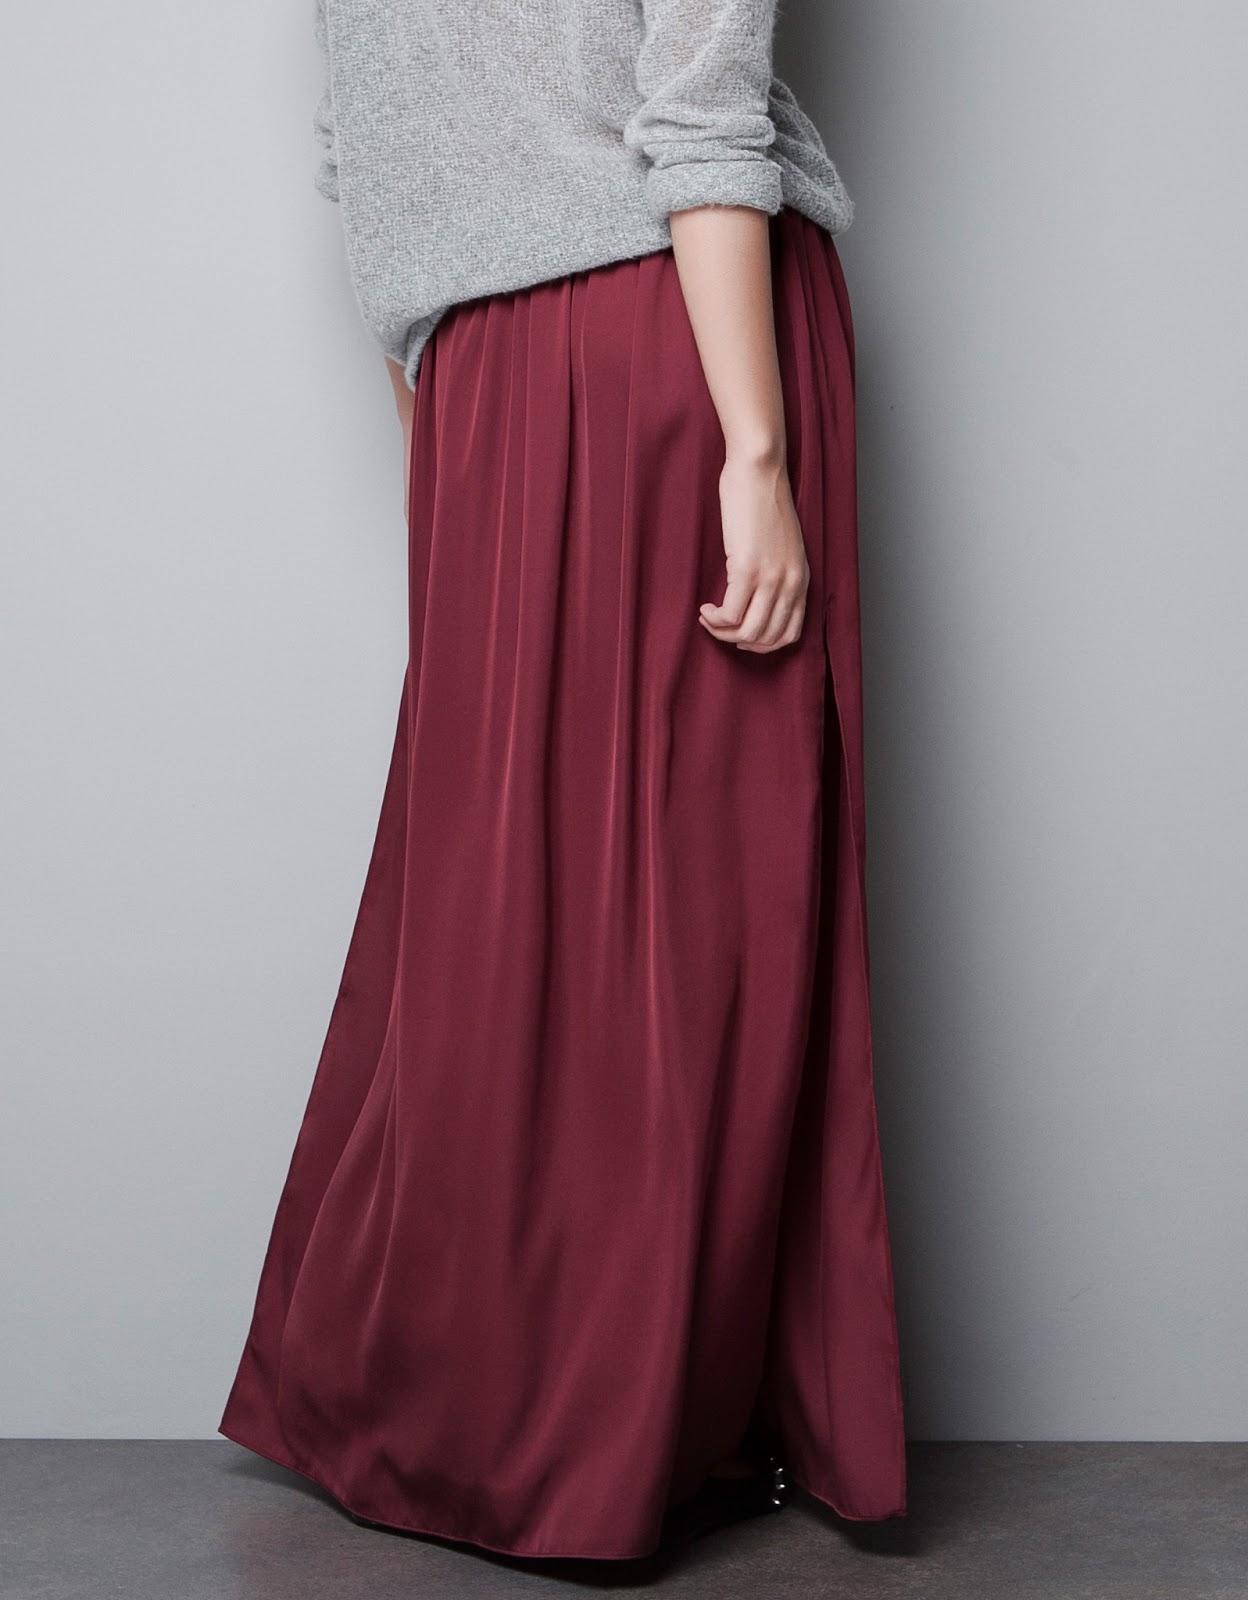 zara sold out maxi skirt dress burgundy wine